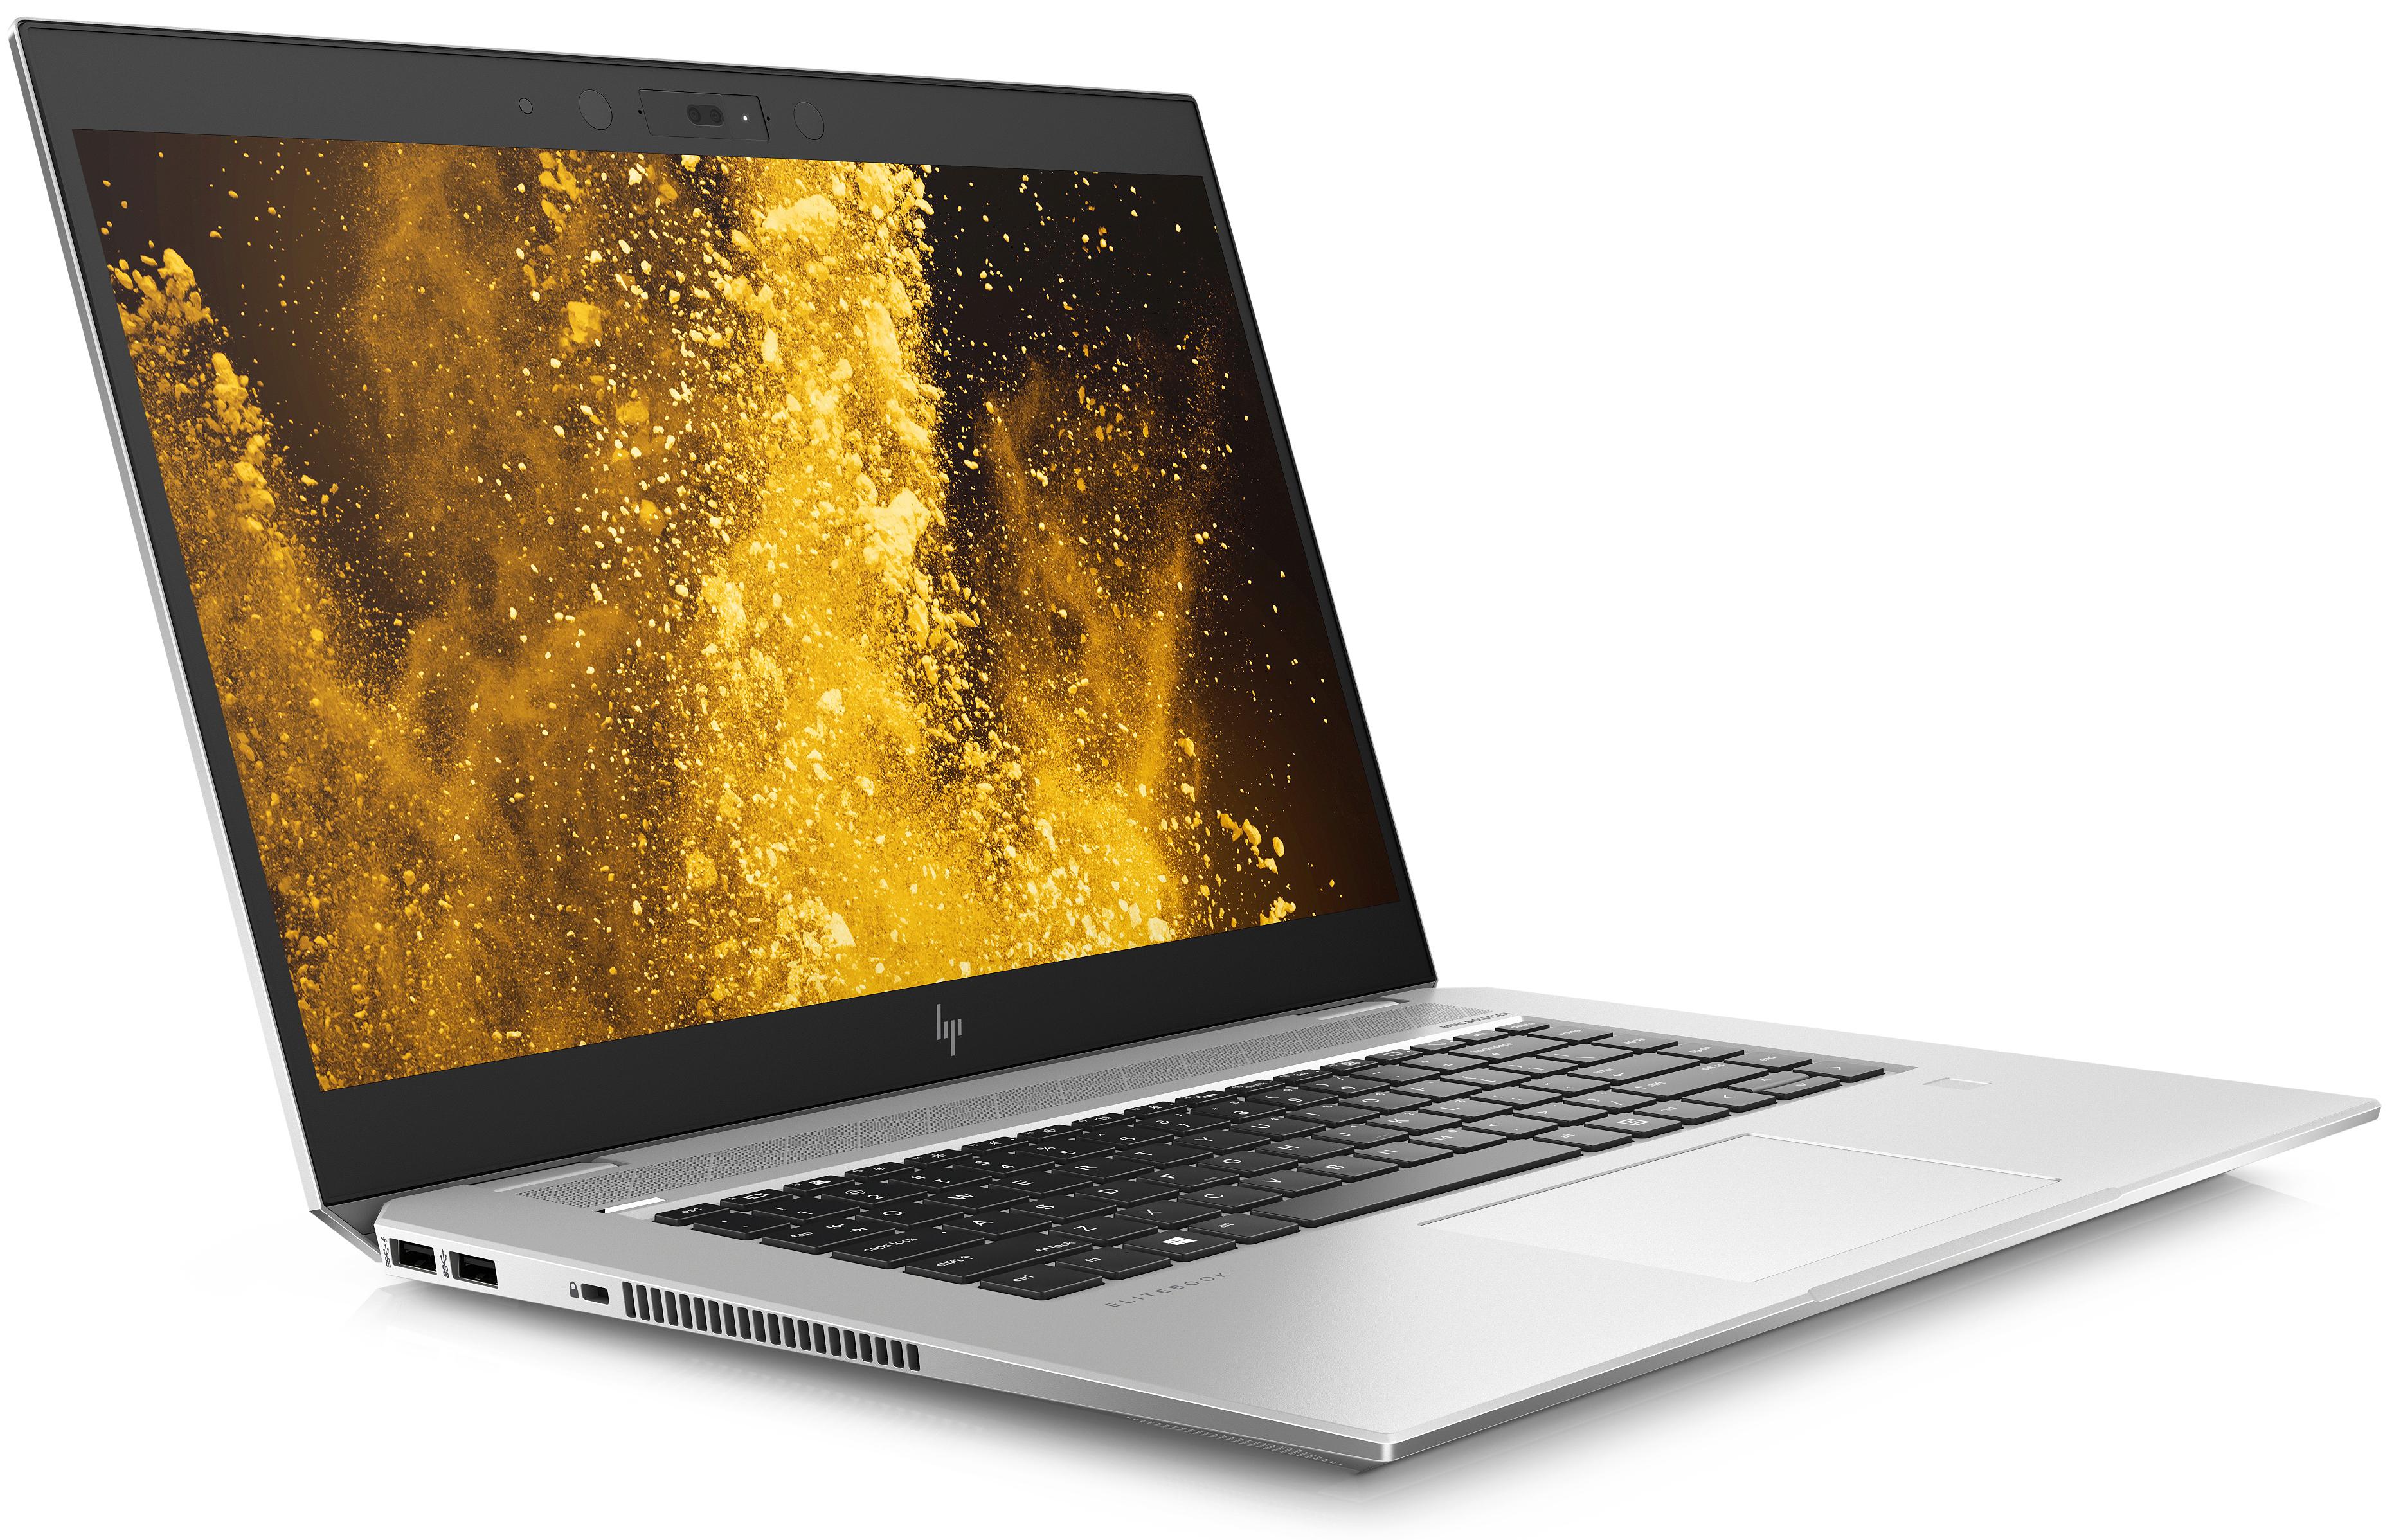 HP EliteBook 1050 G1: Six-Core CPU, NVIDIA GPU, RAID, 15 6